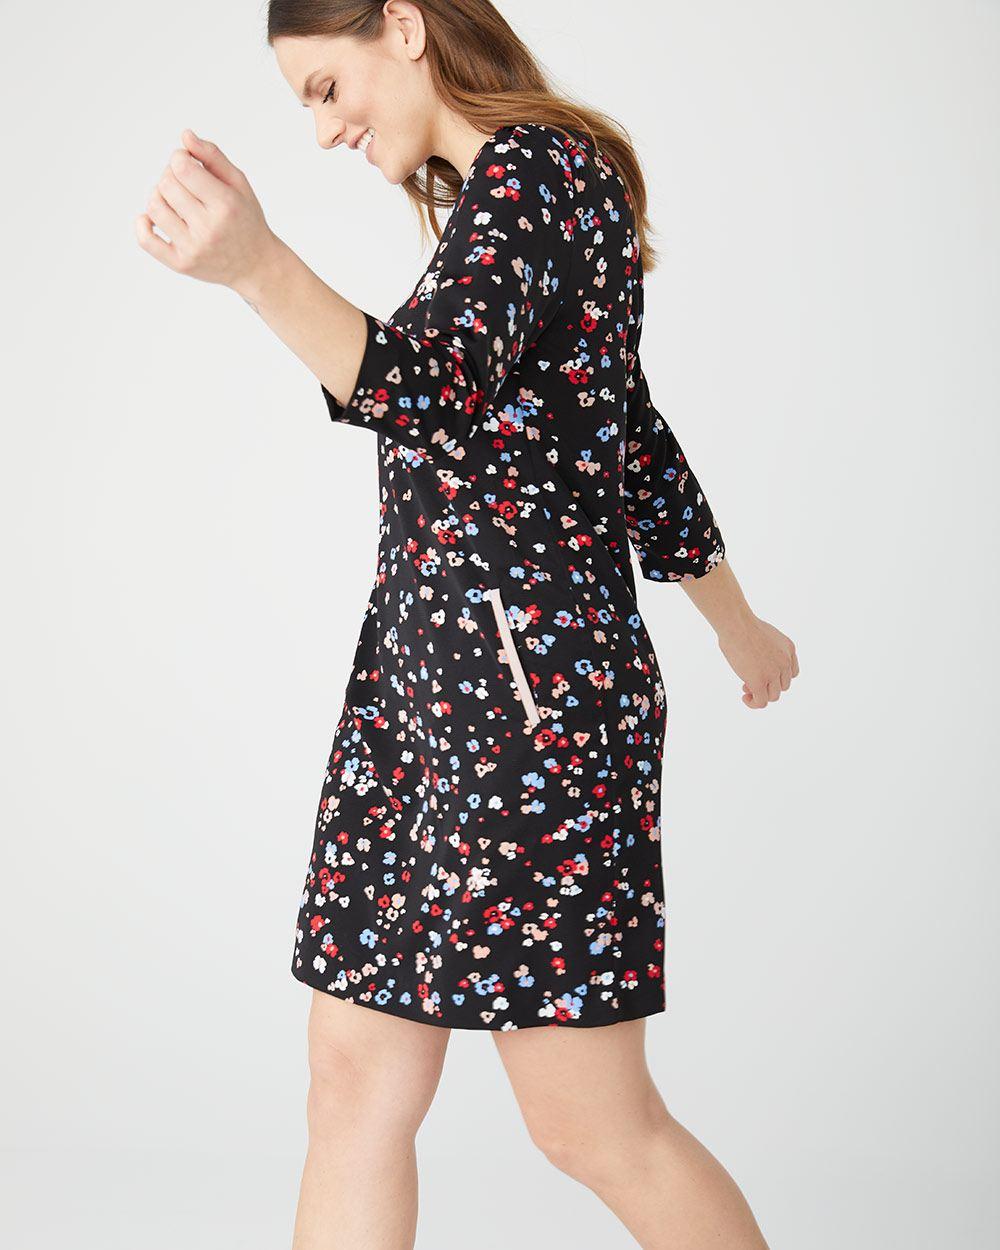 5538cc363b5e05 Floral shift dress | RW&CO.